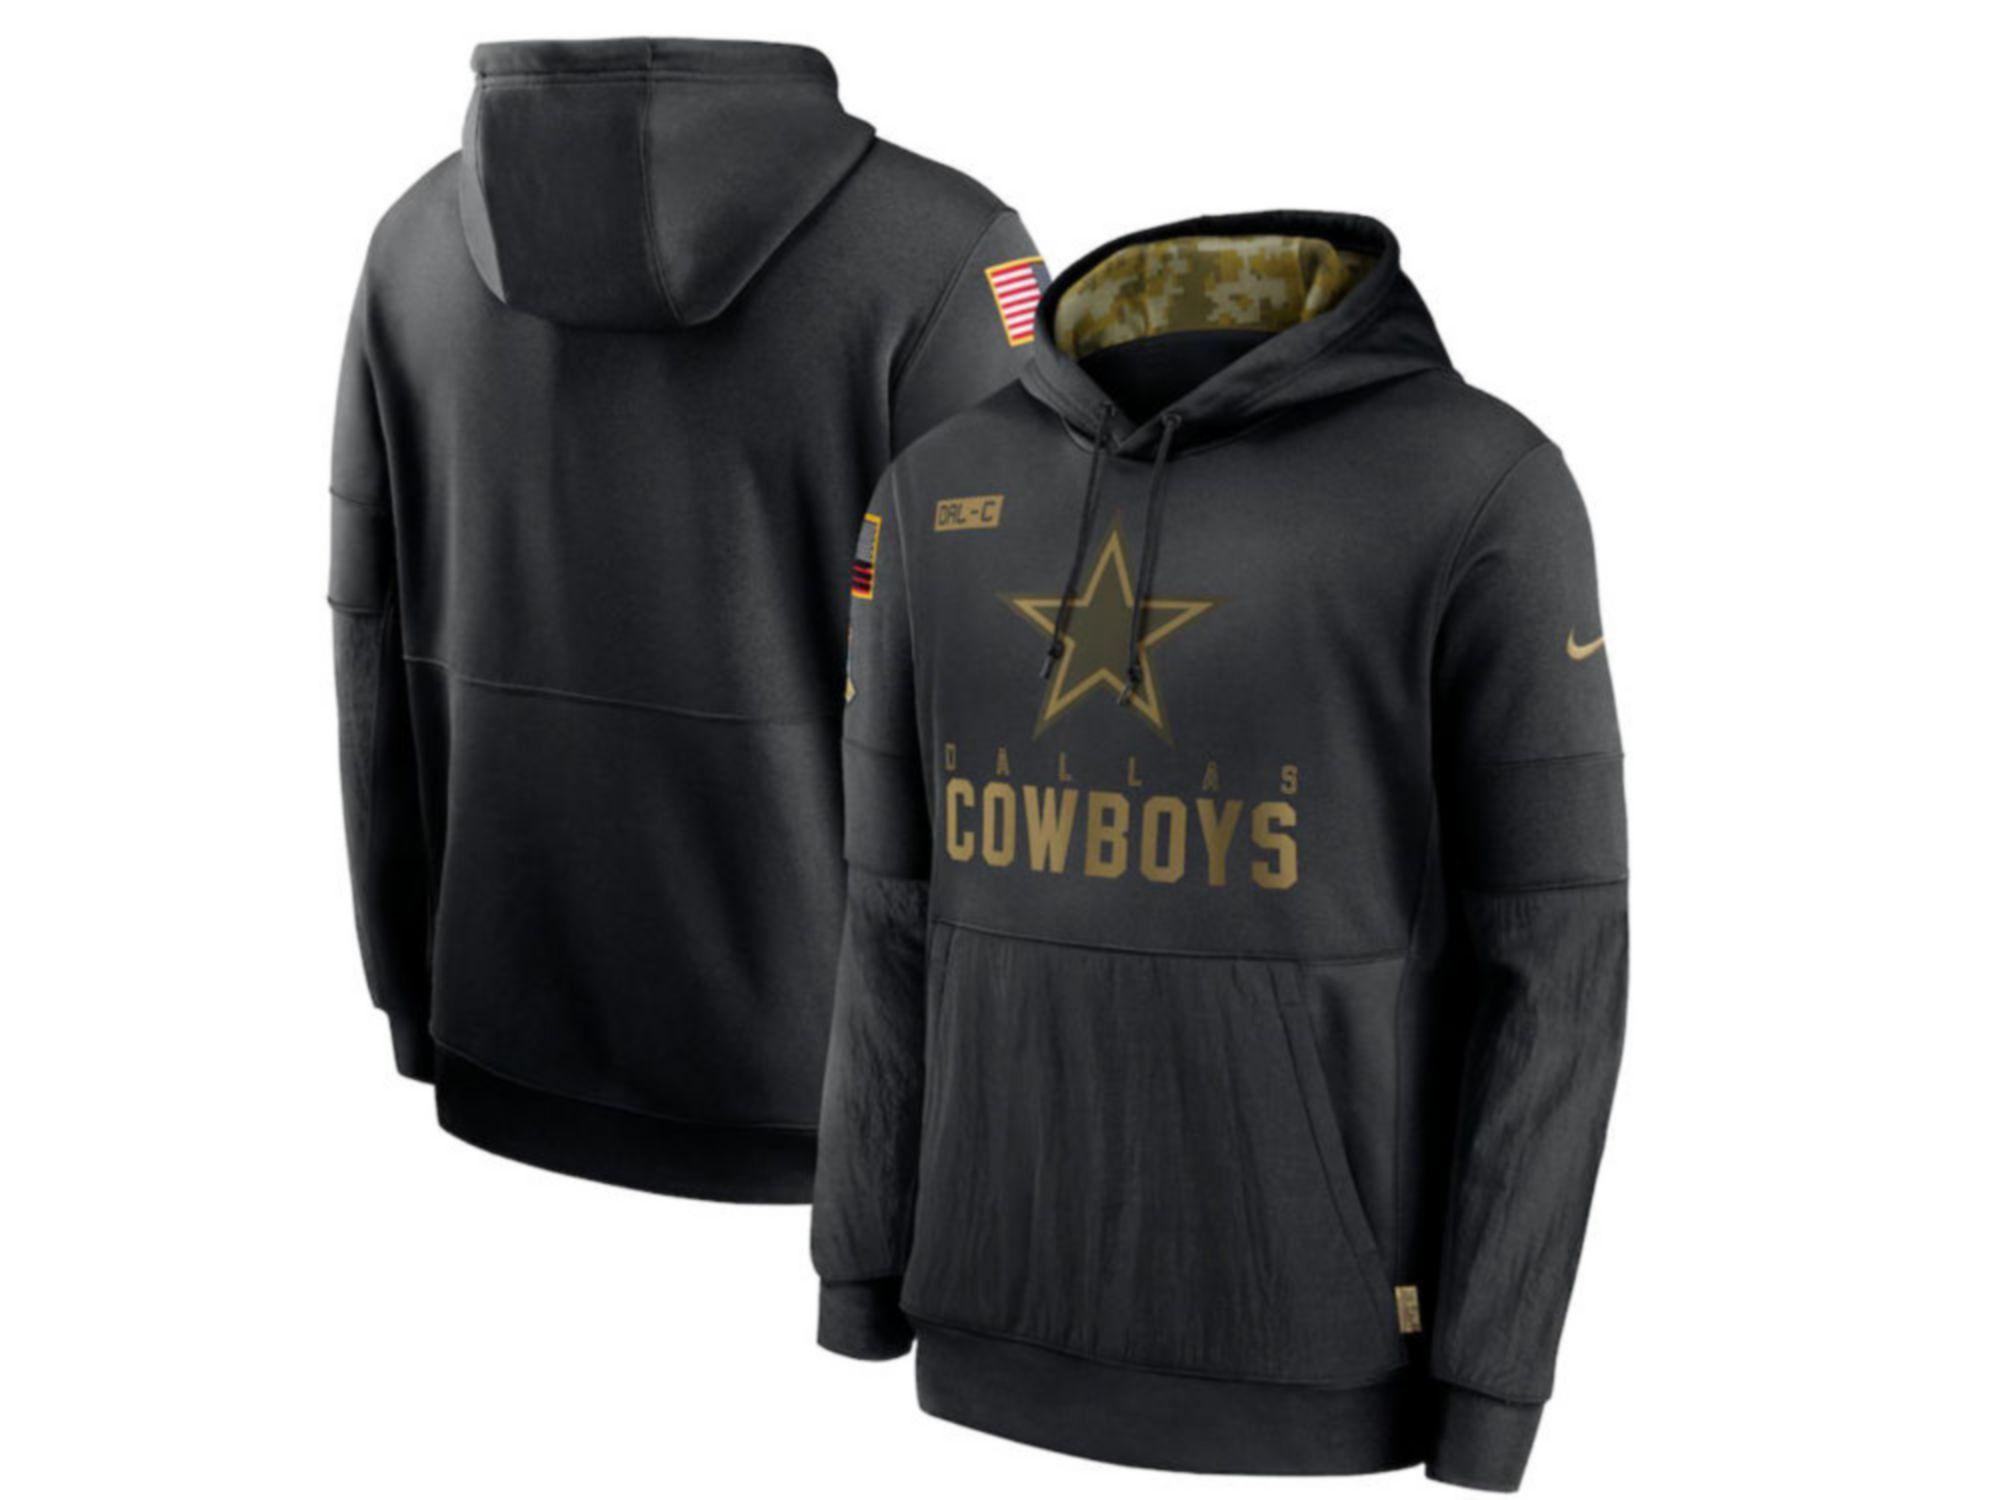 Nike Dallas Cowboys 2020 Men's Salute to Service Therma Hoodie & Reviews - NFL - Sports Fan Shop - Macy's